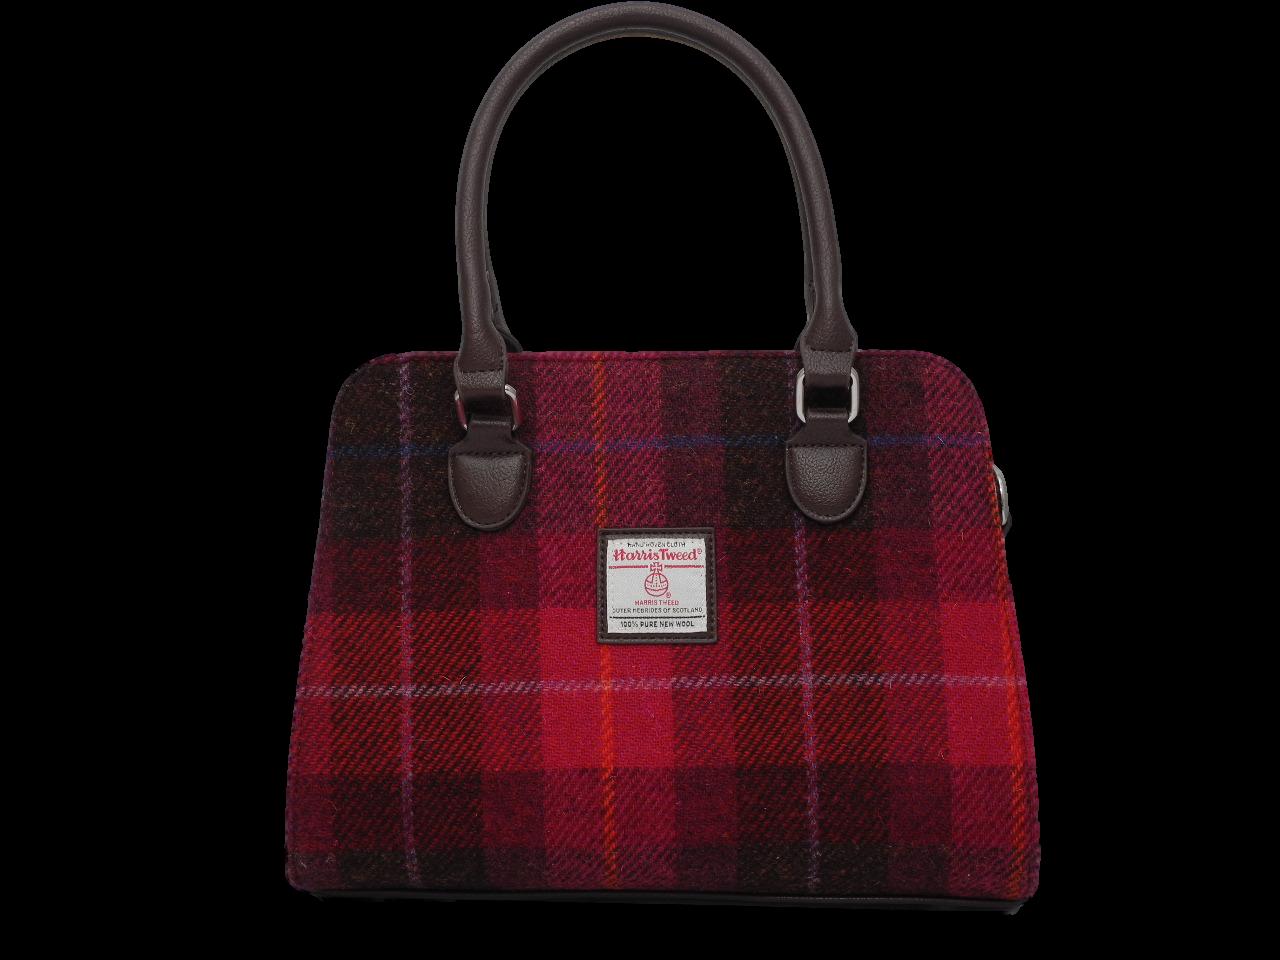 scottish ladies gift harris tweed handbag shoulder bag red check